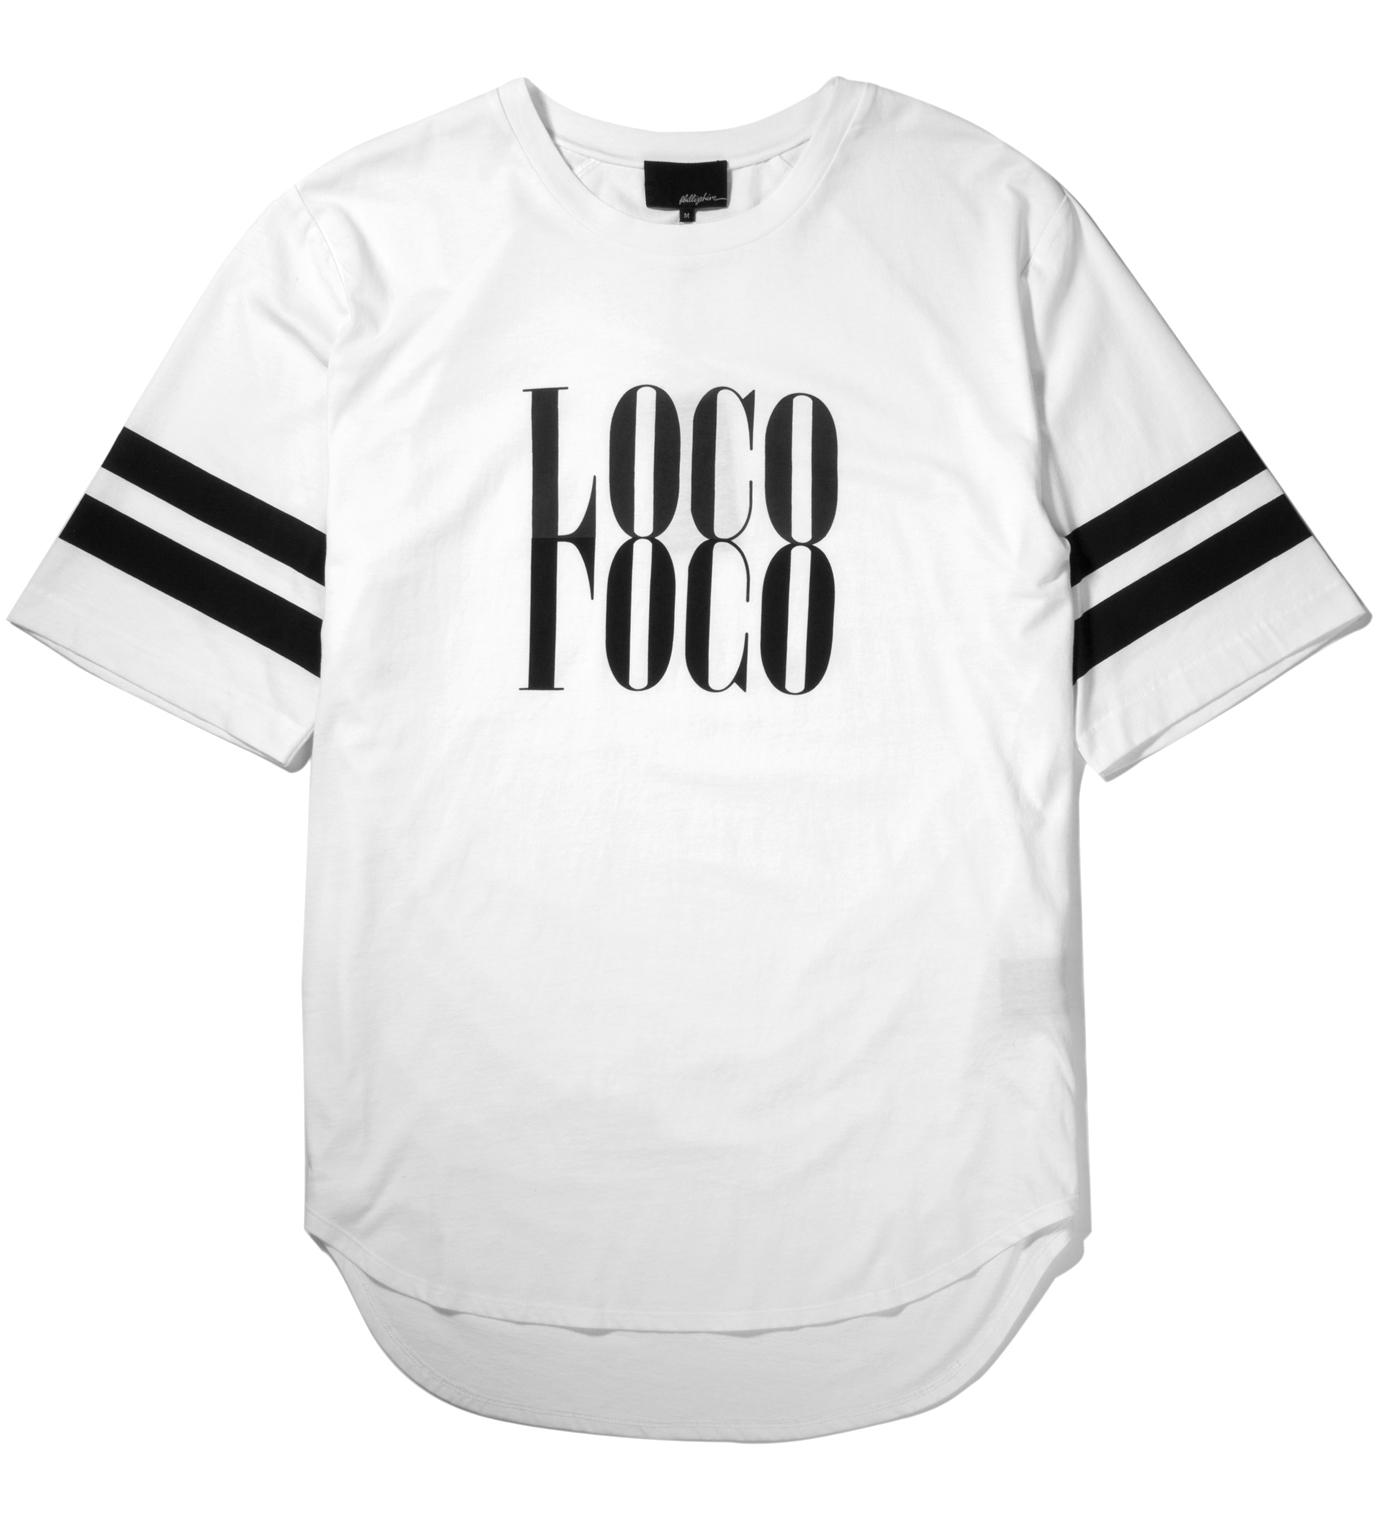 3.1 Phillip Lim Antique White Crewneck with Mirrored Loco Print T-Shirt